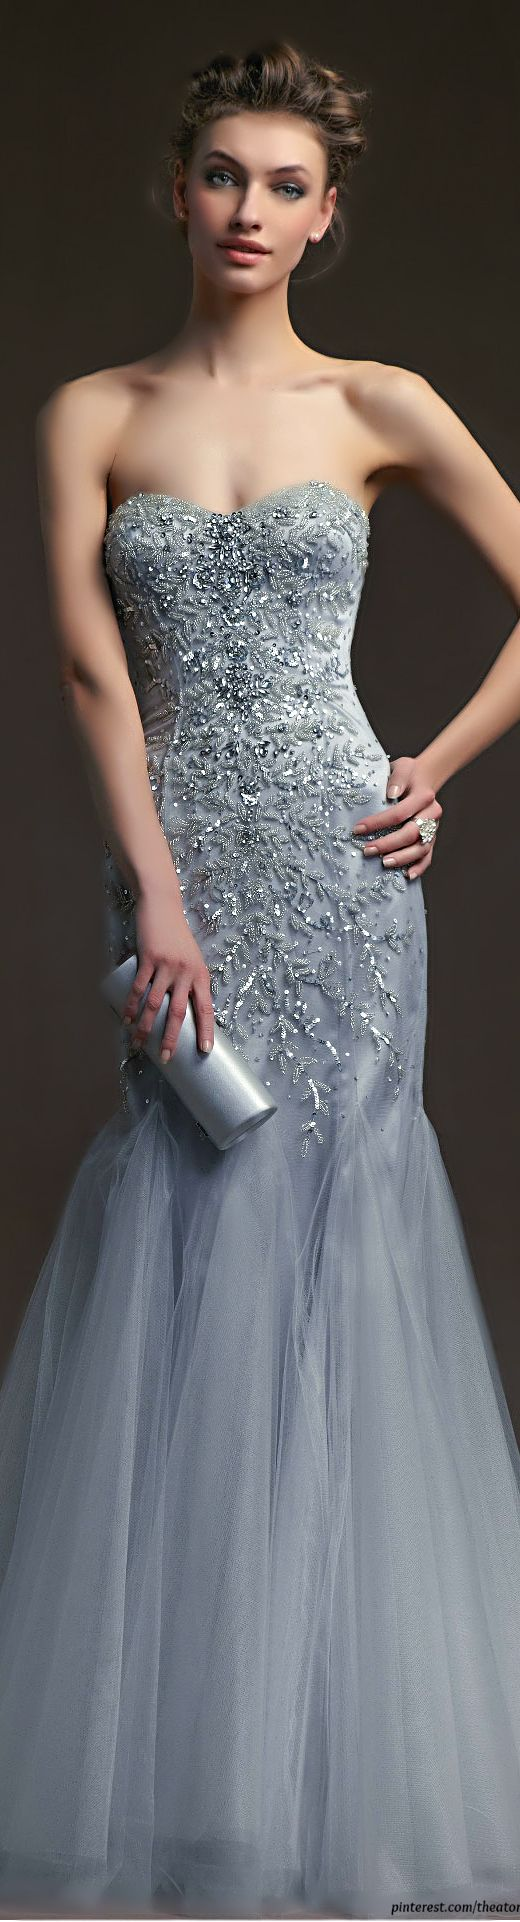 Pin by sanaz tabatabaei on night gown pinterest neckline